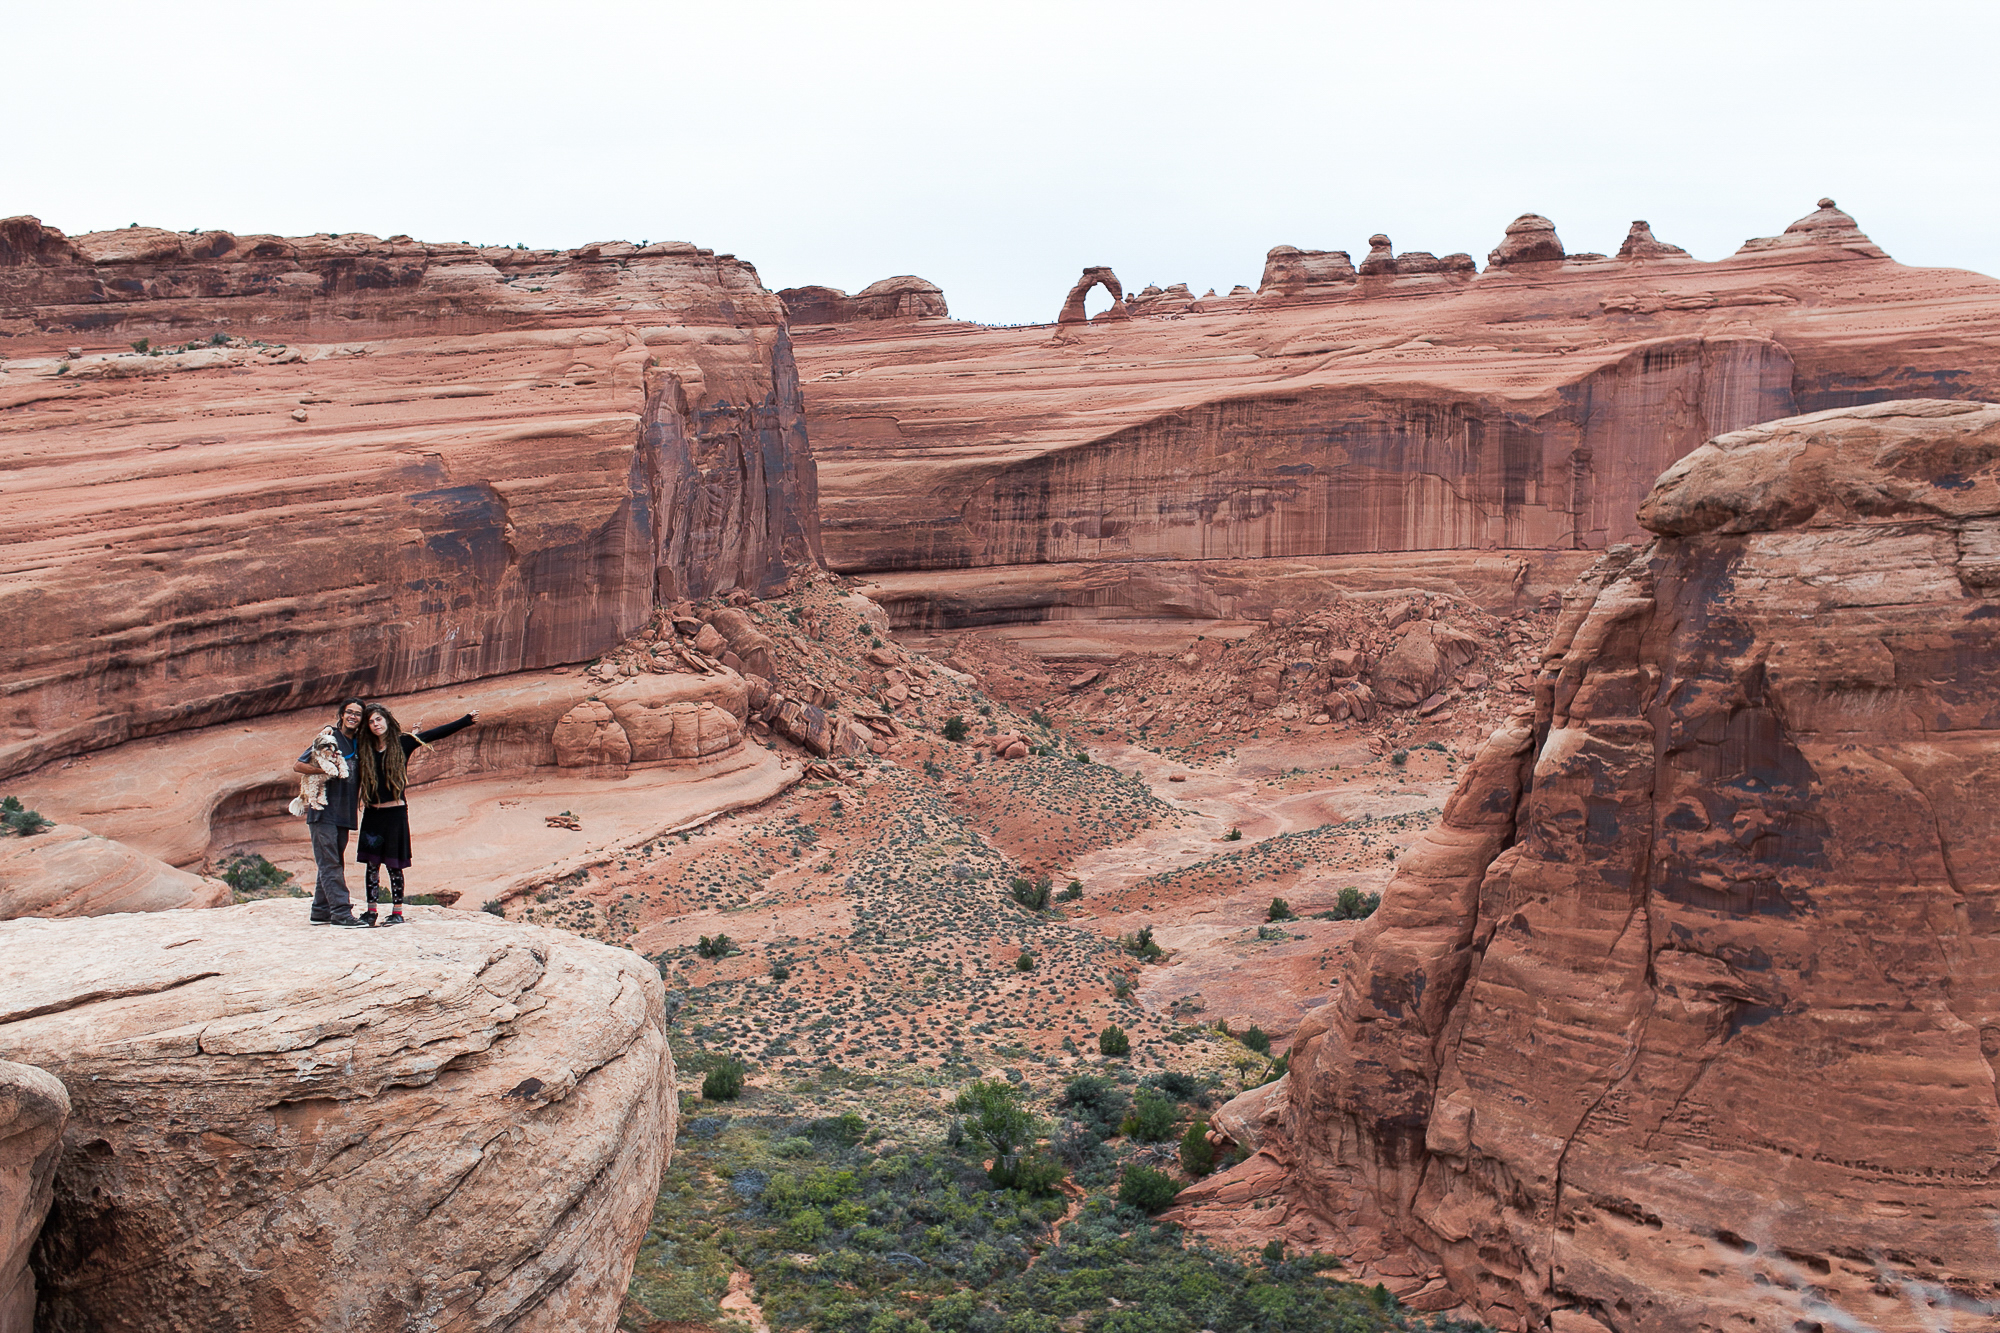 066Travel_Adventure_Outdoor_Photography_Outlive_Creative_Utah_Dessert_Road_Trip.jpg